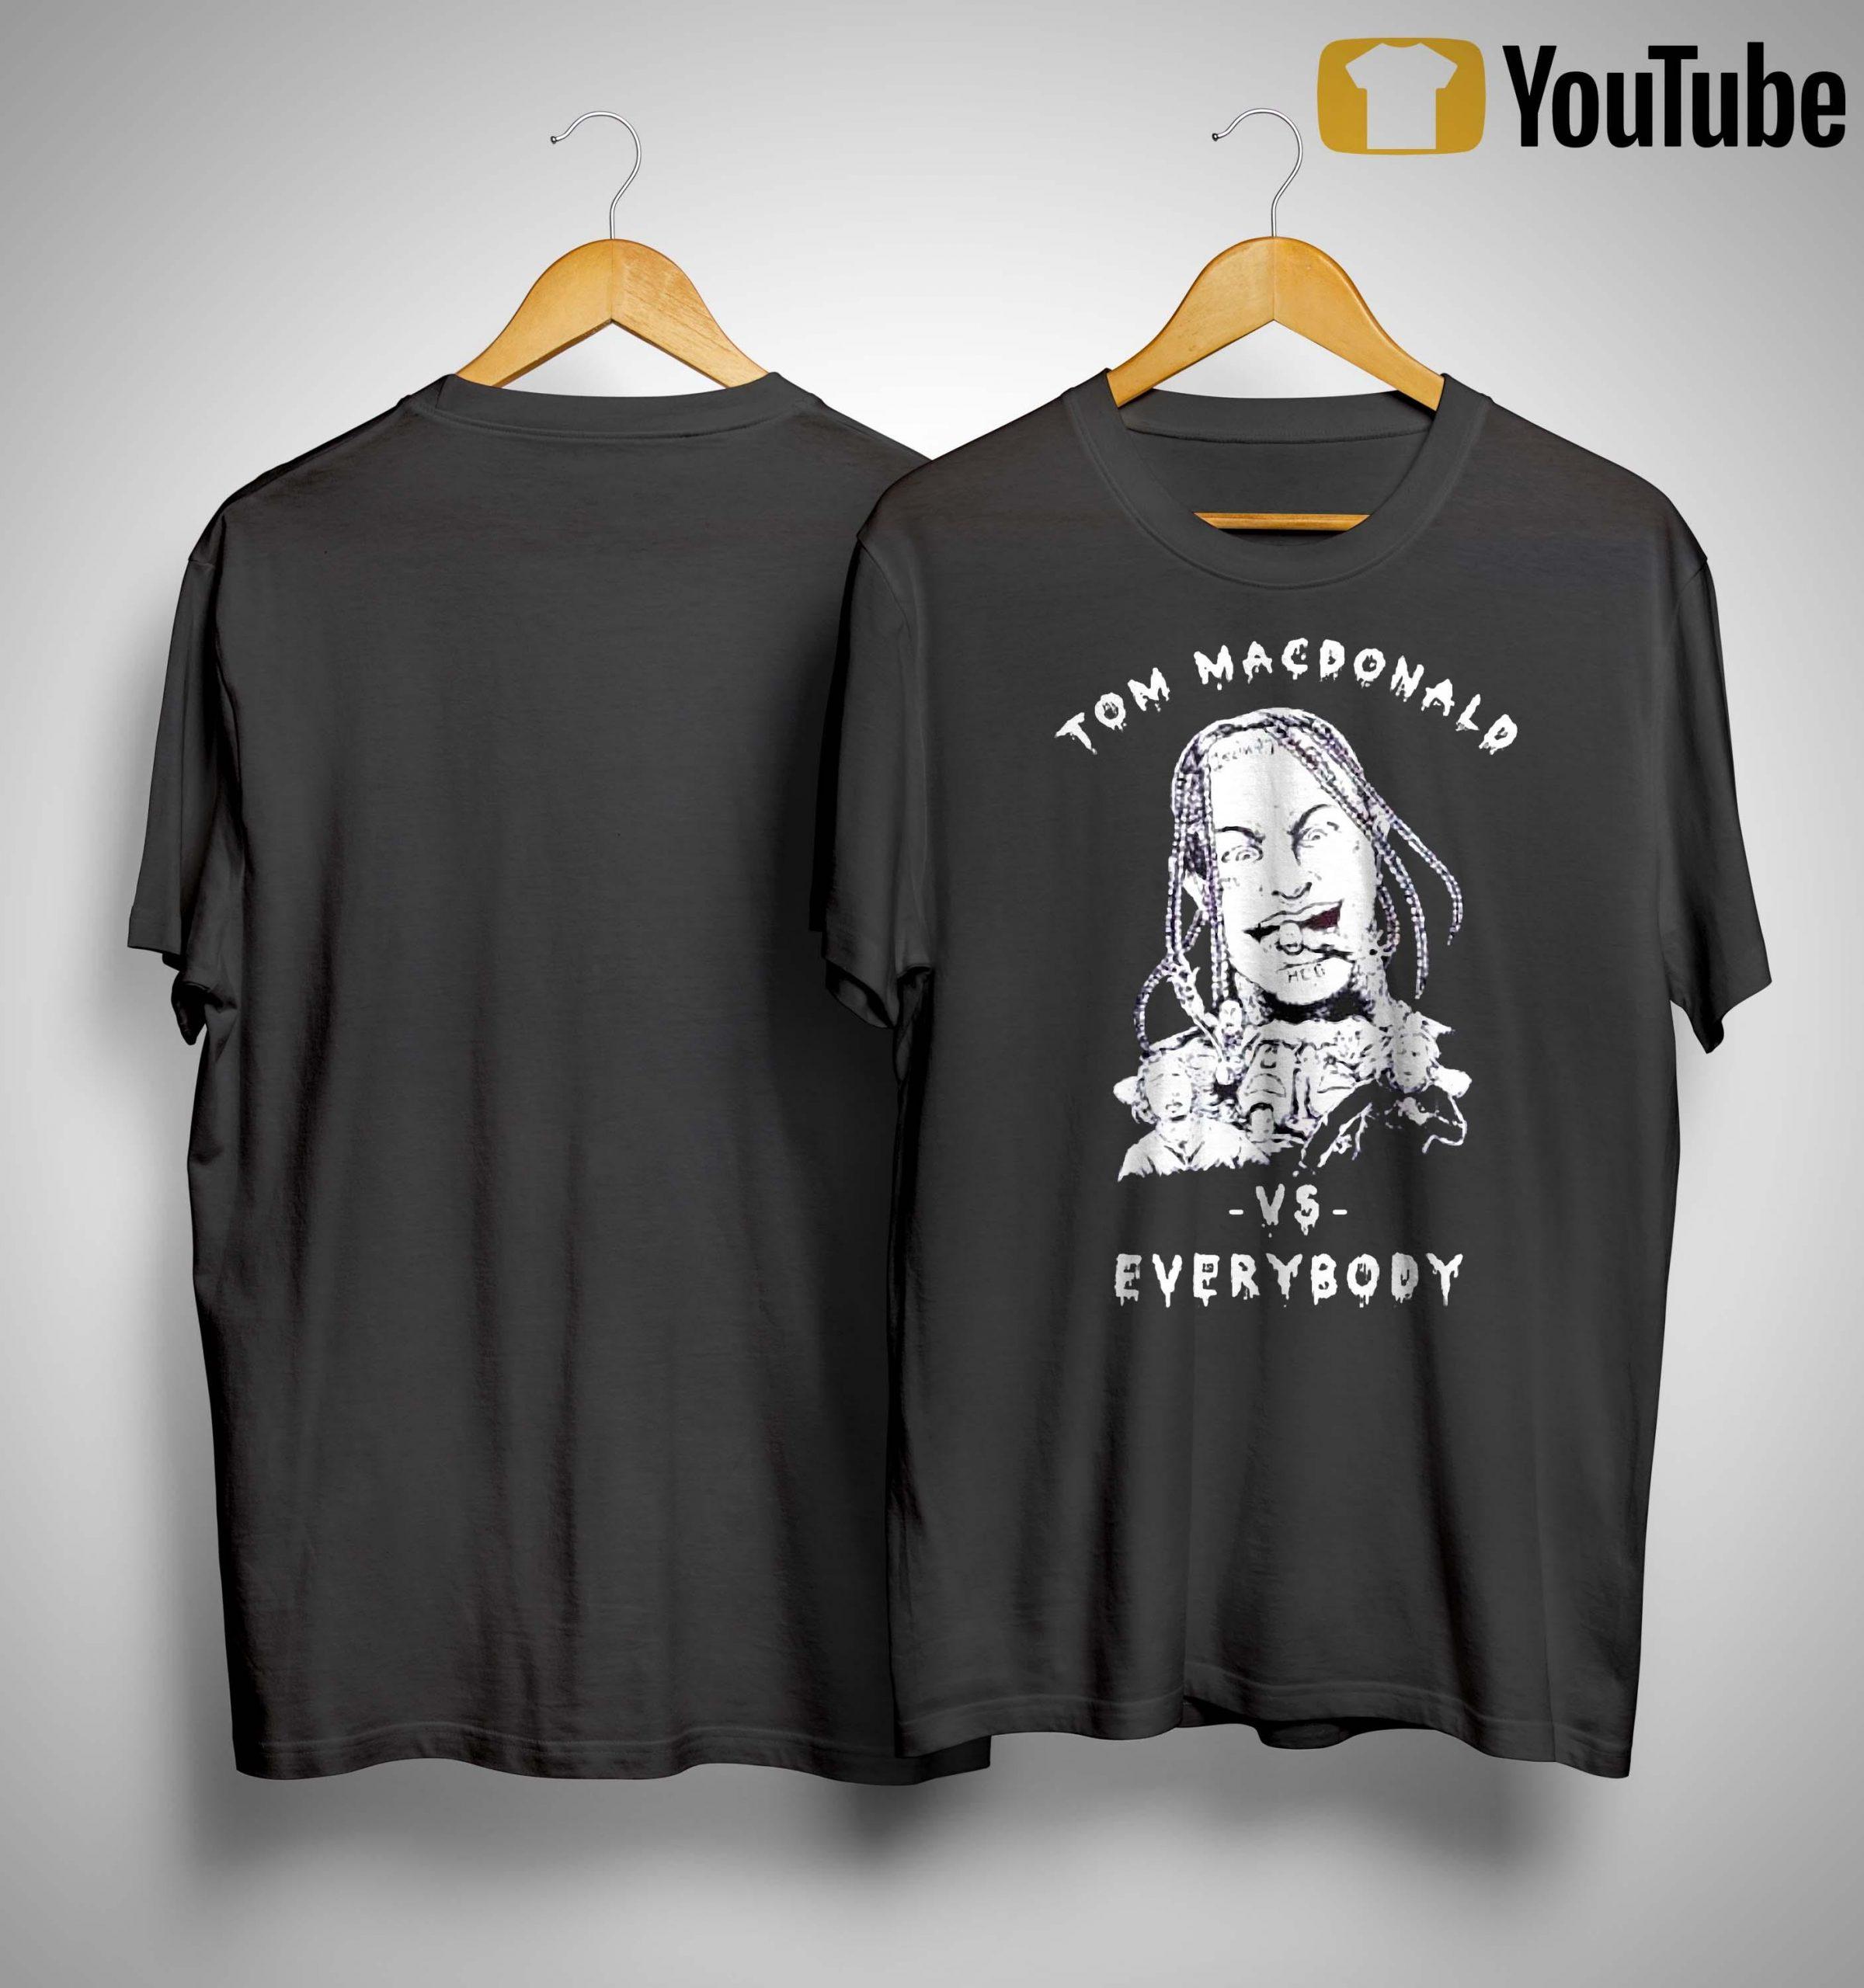 Tom Macdonald Vs Everybody Shirt